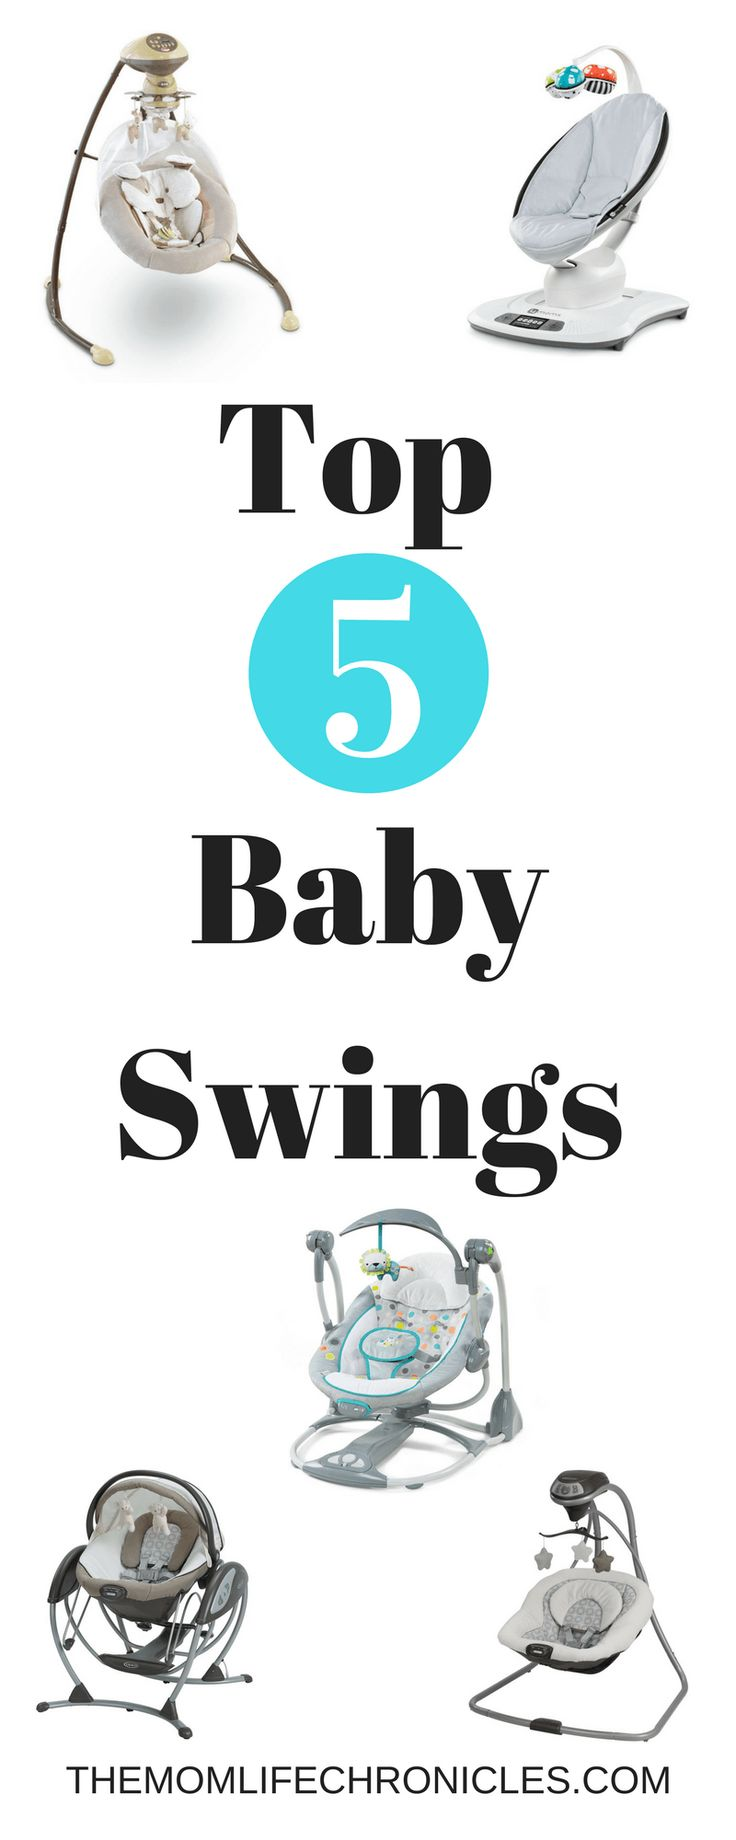 Best Baby Swings: Top 5 Baby Swings in 2017 | Baby| Baby Gear| Baby Equipment| Baby Swings|